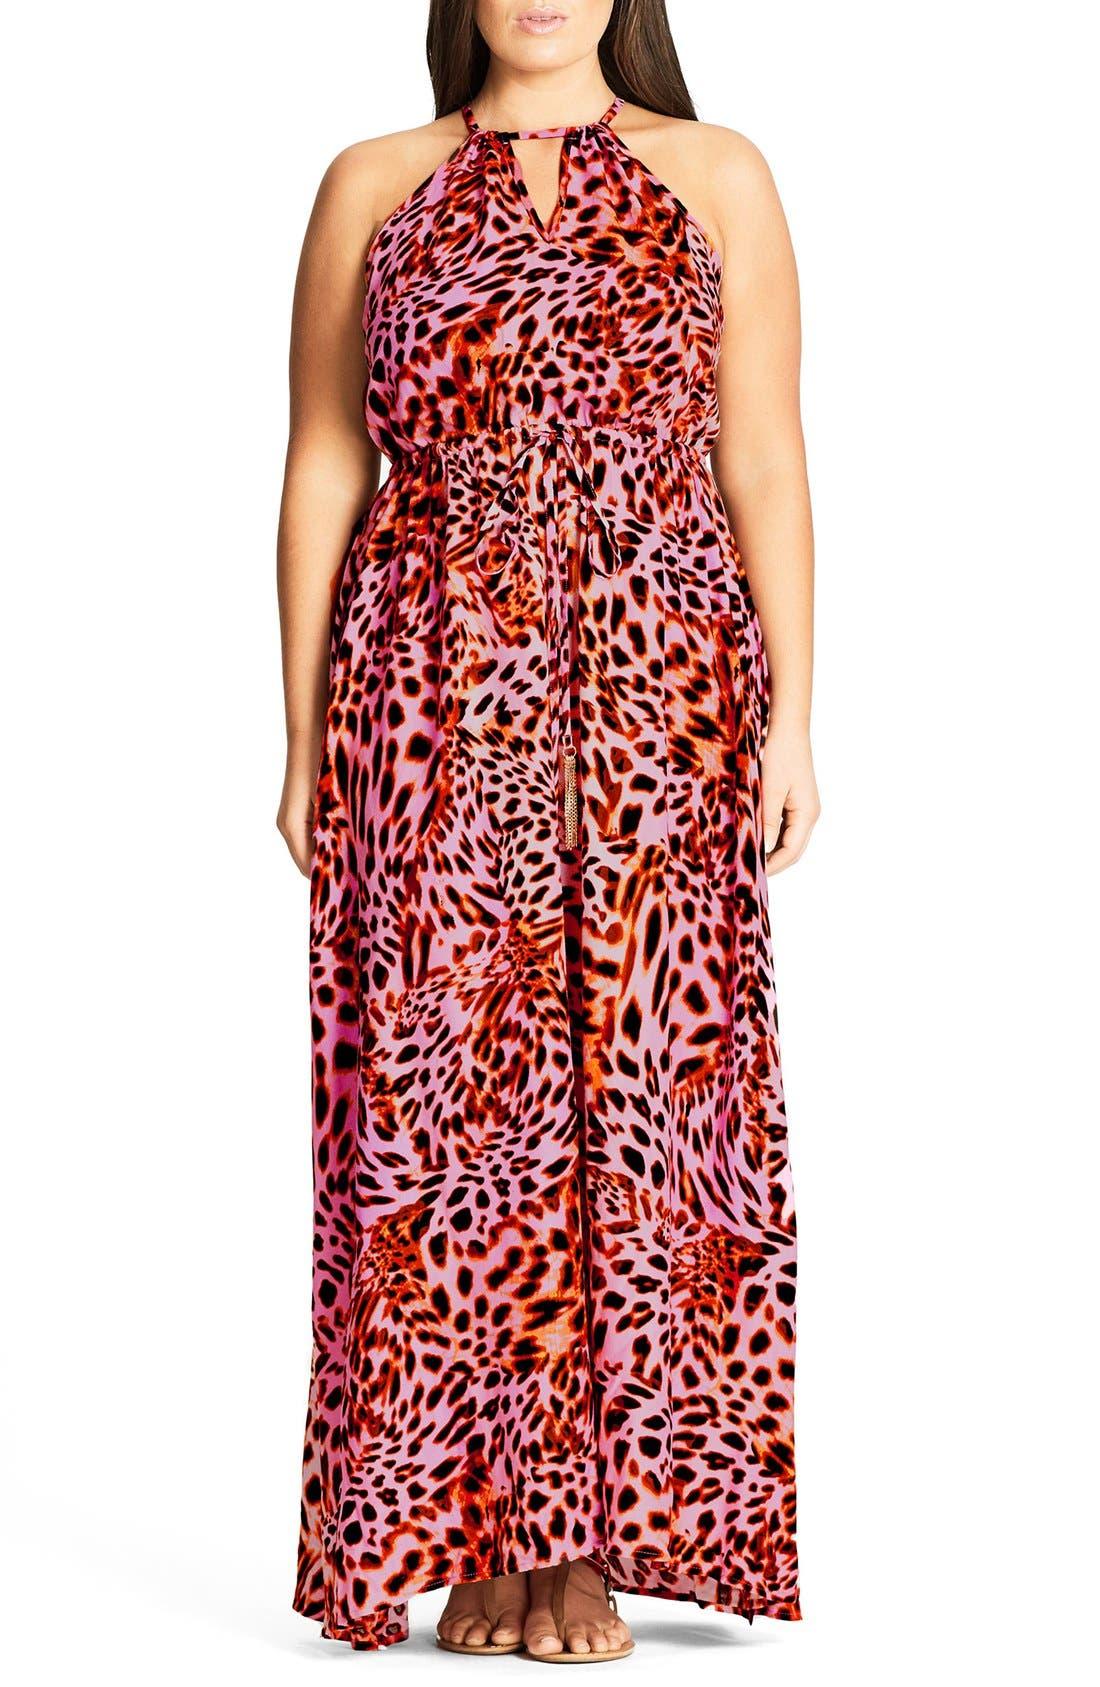 City Chic Leopard Drawstring Waist Maxi Dress (Plus Size)